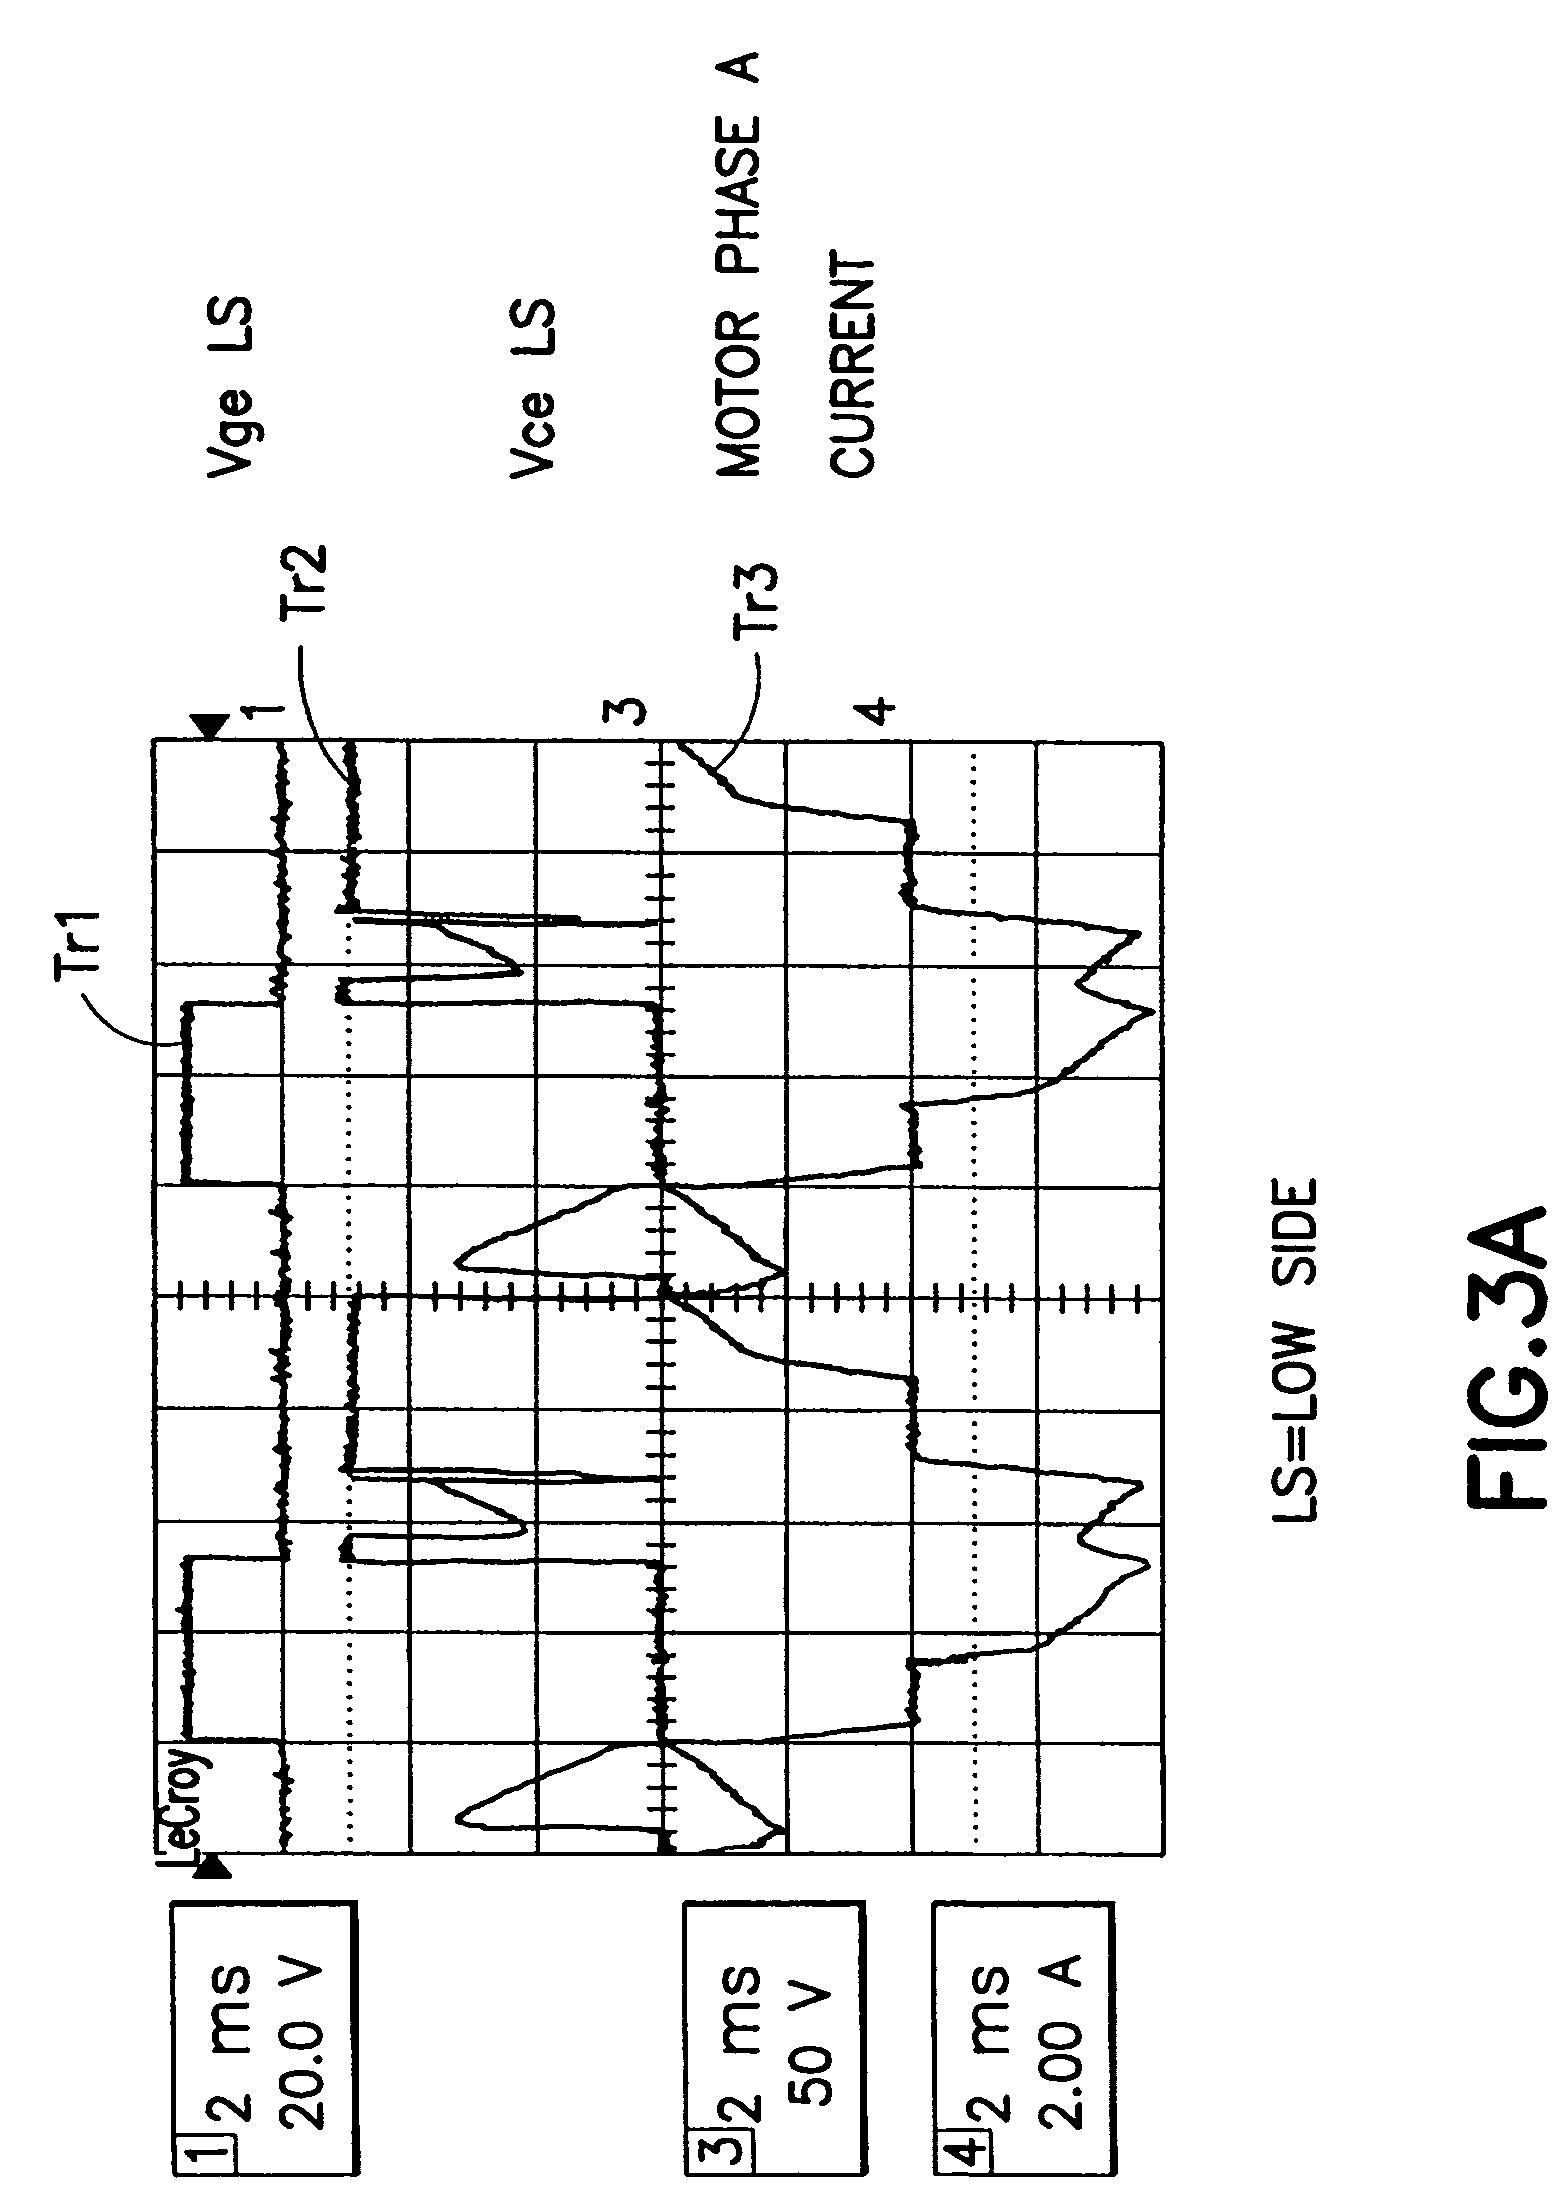 ibanez rg 320 dx wiring diagram 03 jetta 2 0 engine and schematics perfect sz320 photo electrical